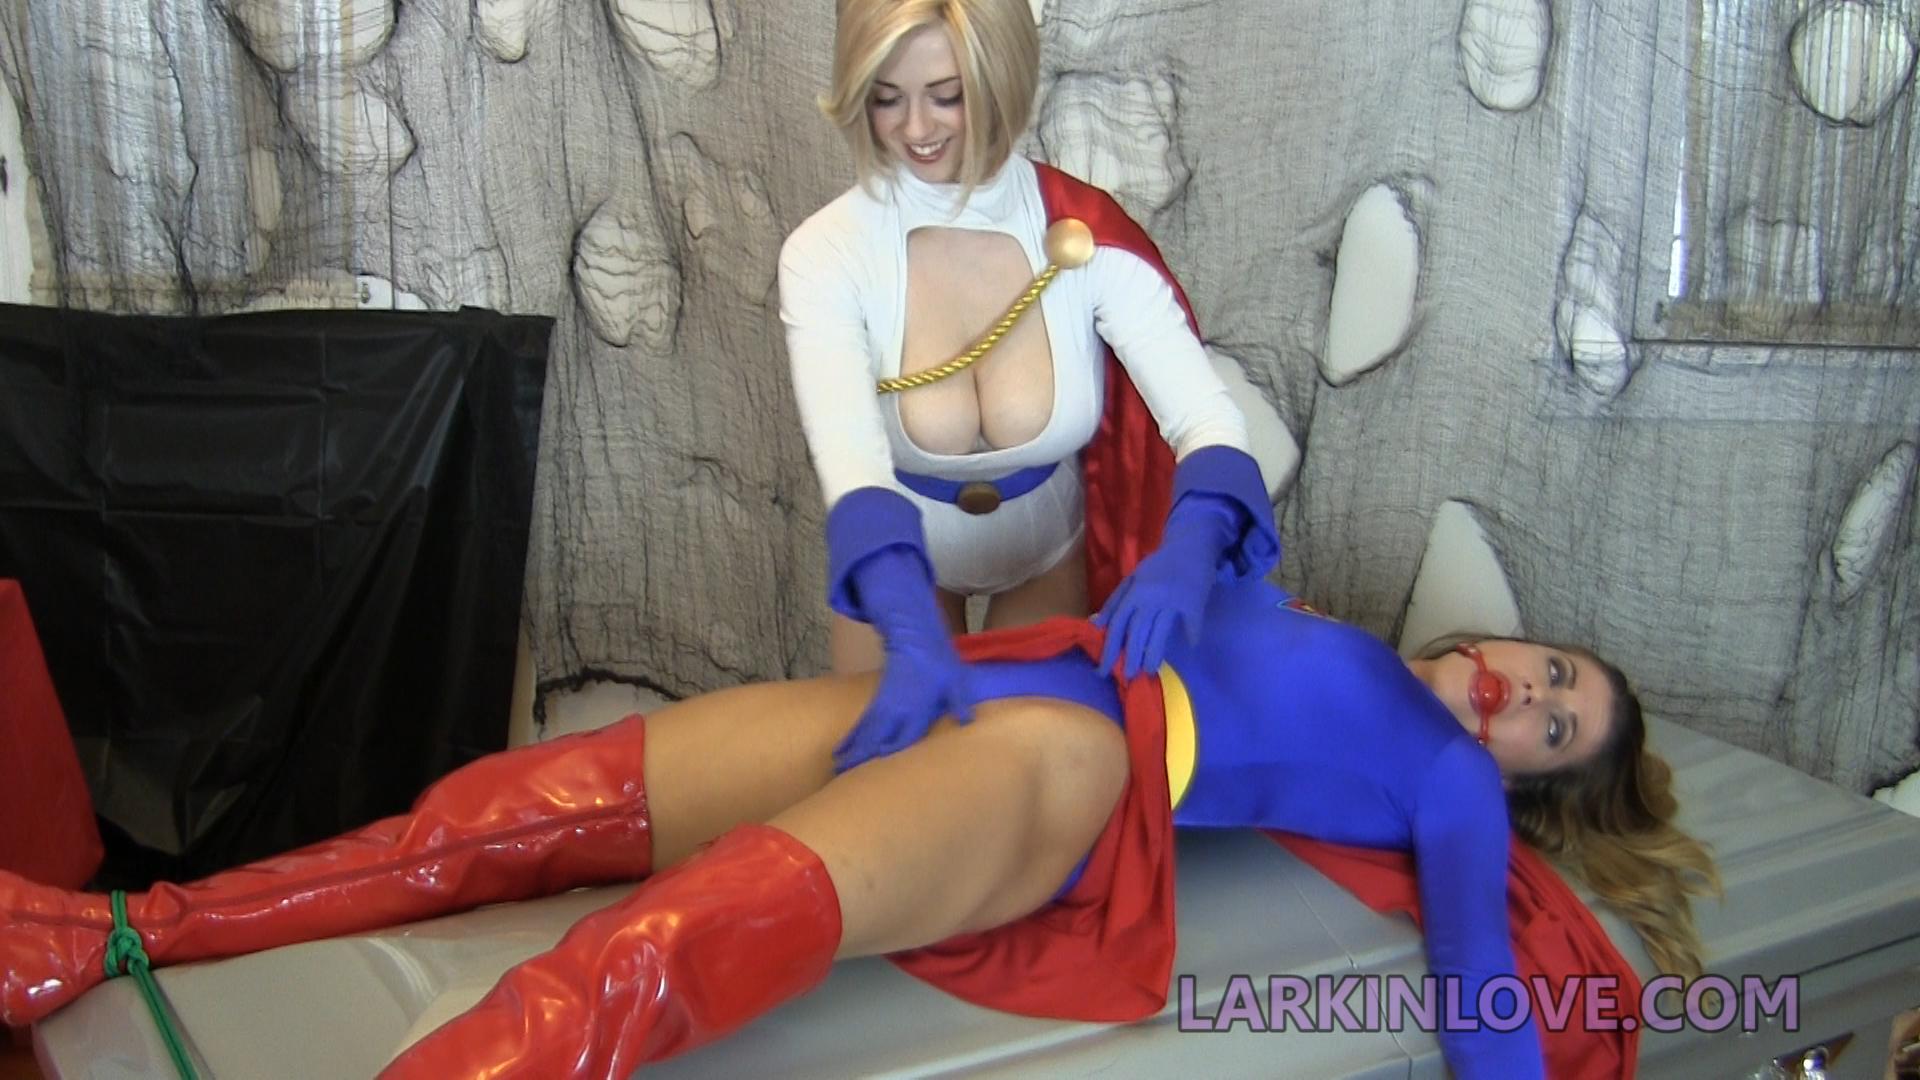 Spanish porn stars pics belle nubiles nude spreading sex porn images. ow ly image uploaded by misslarkinlove larkin love